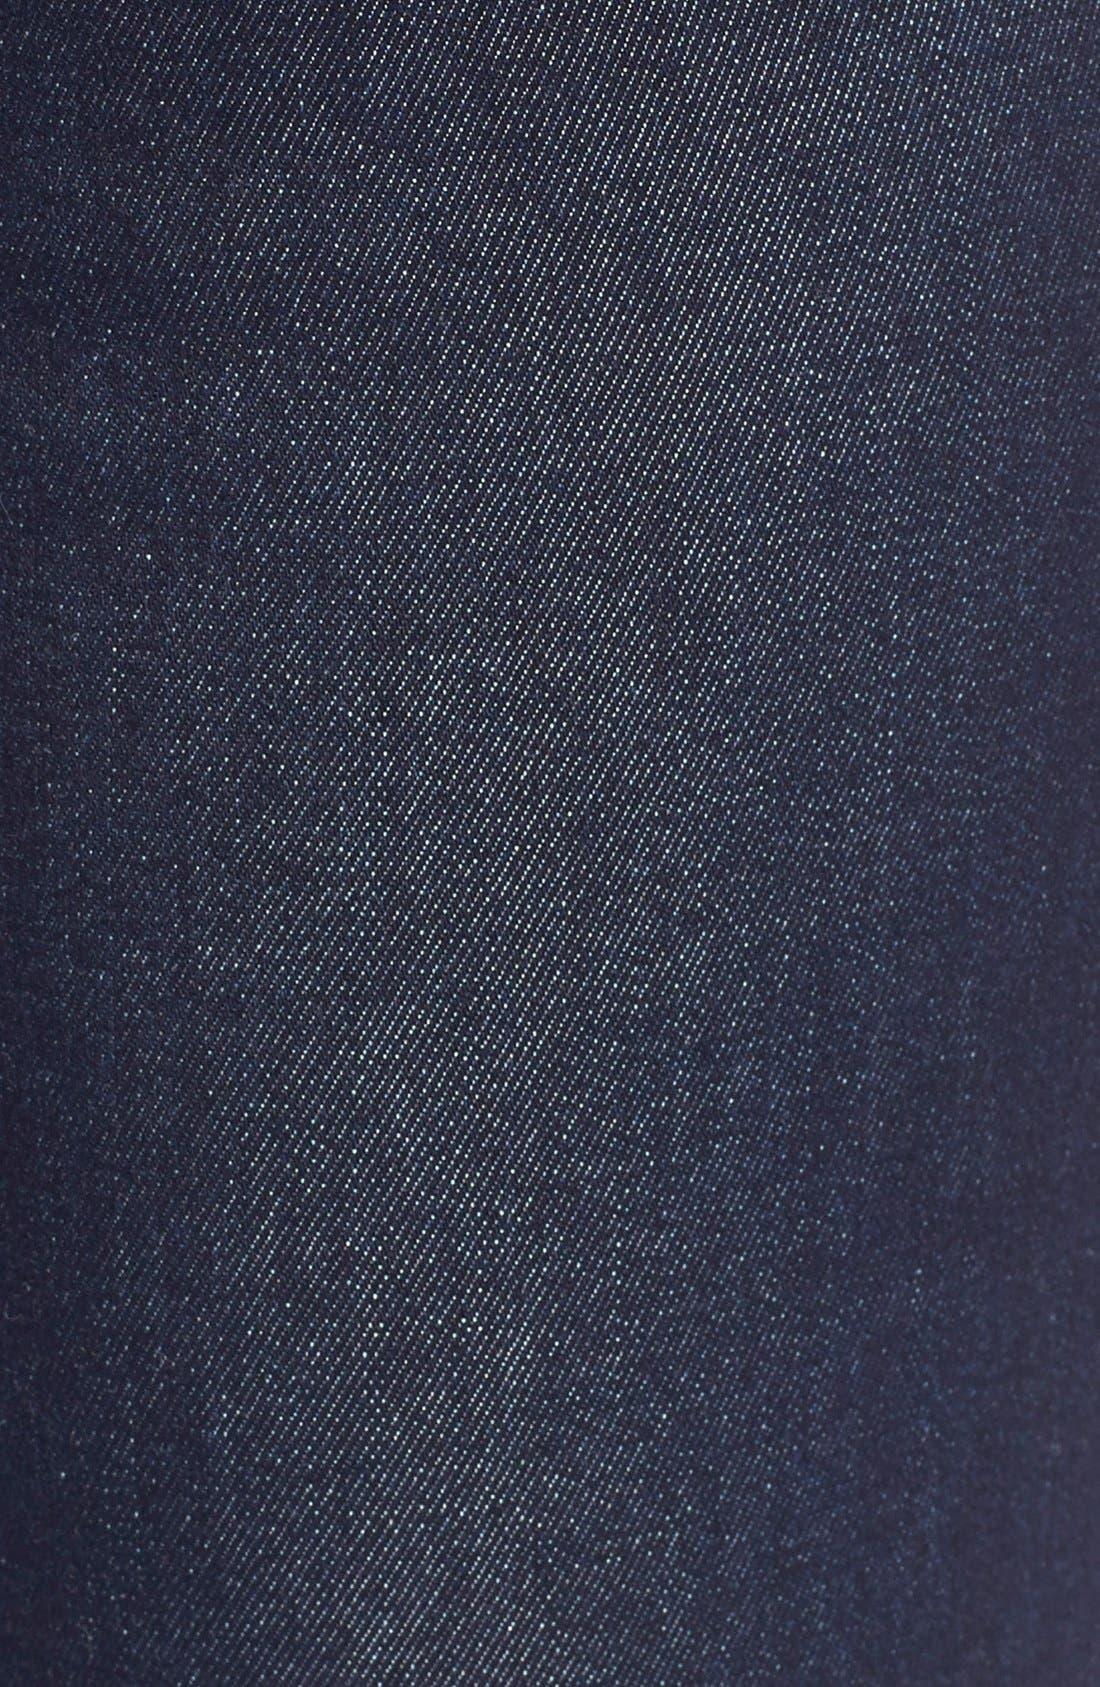 'Sculpt - Rocket' High Rise Skinny Jeans,                             Alternate thumbnail 5, color,                             406